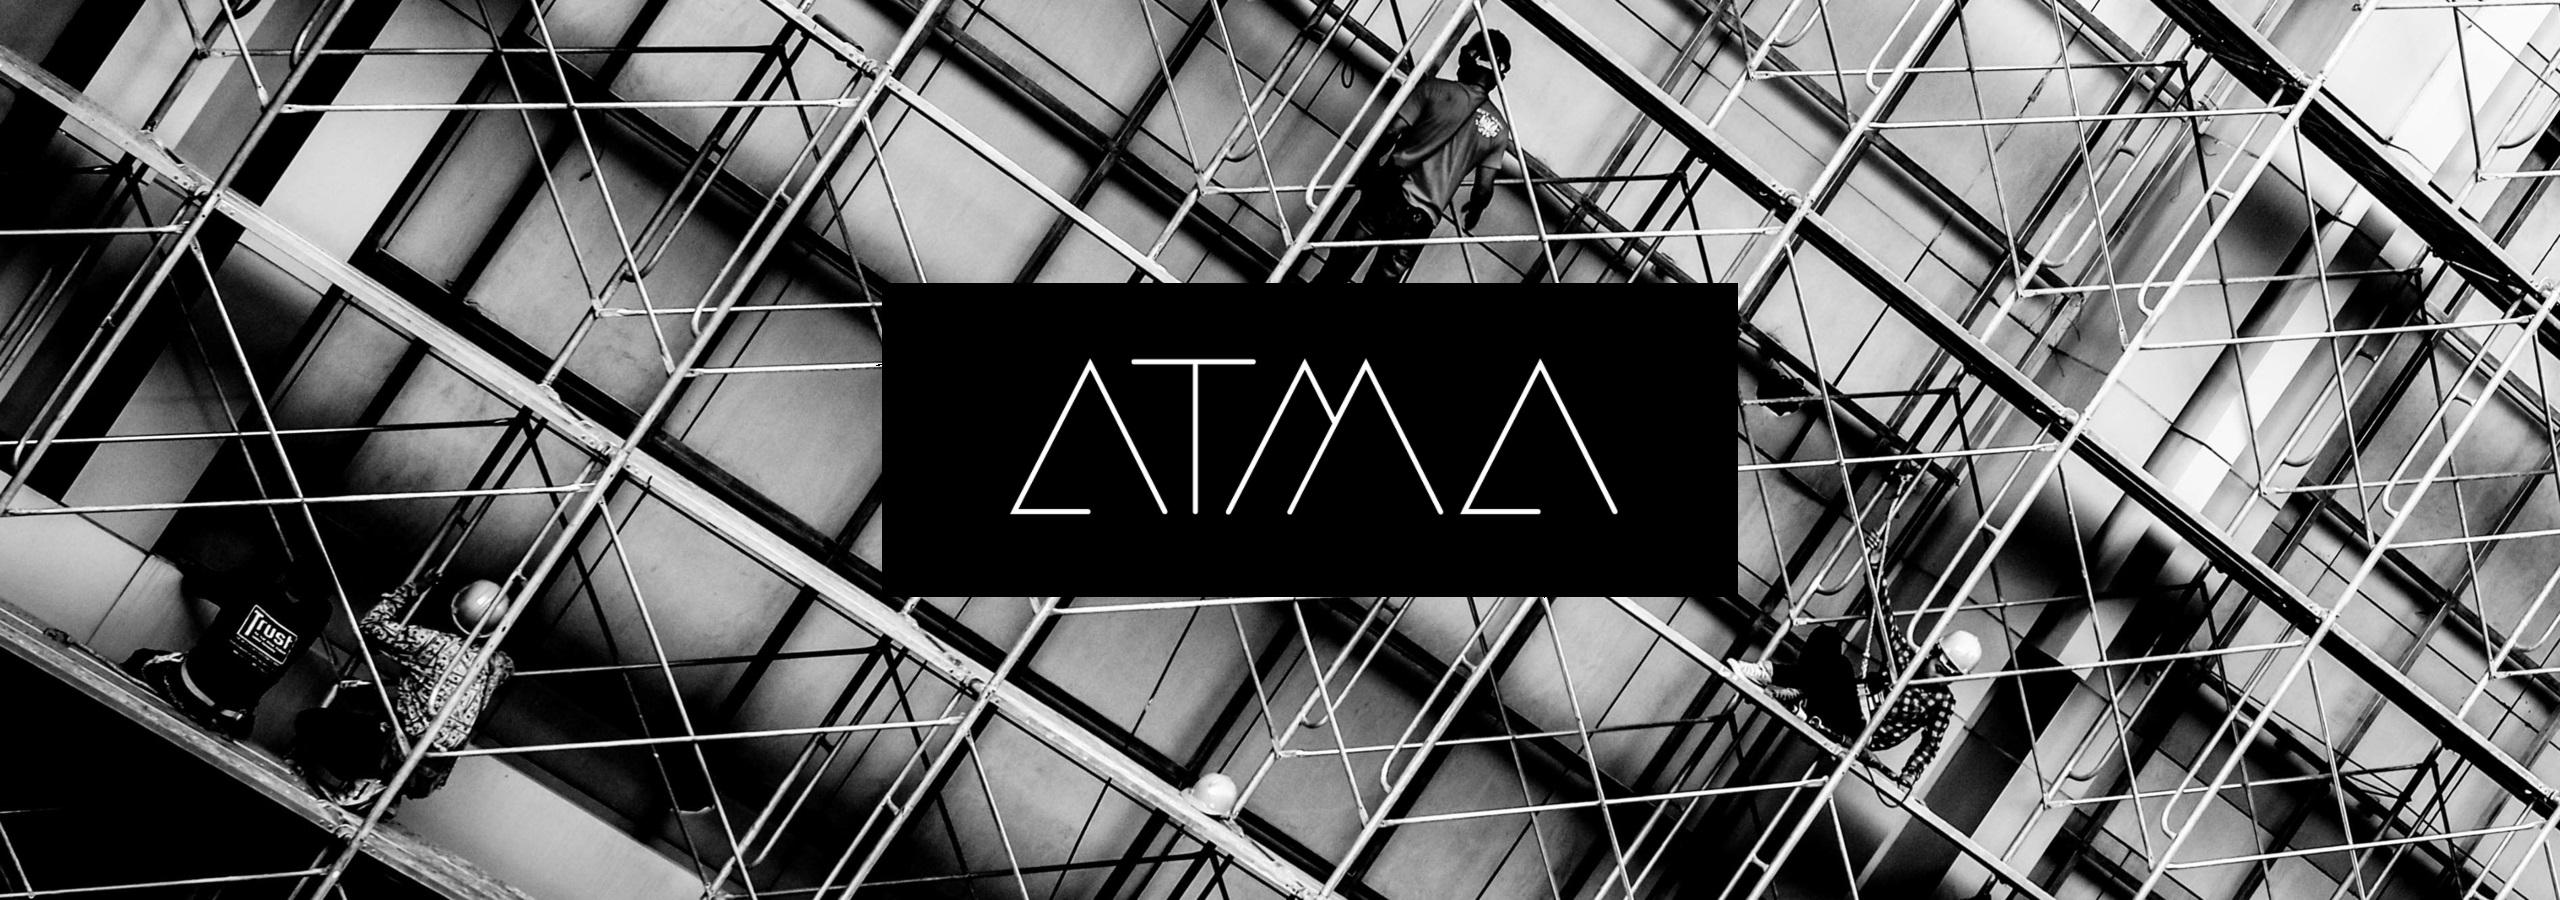 ATMA (@atma) Cover Image